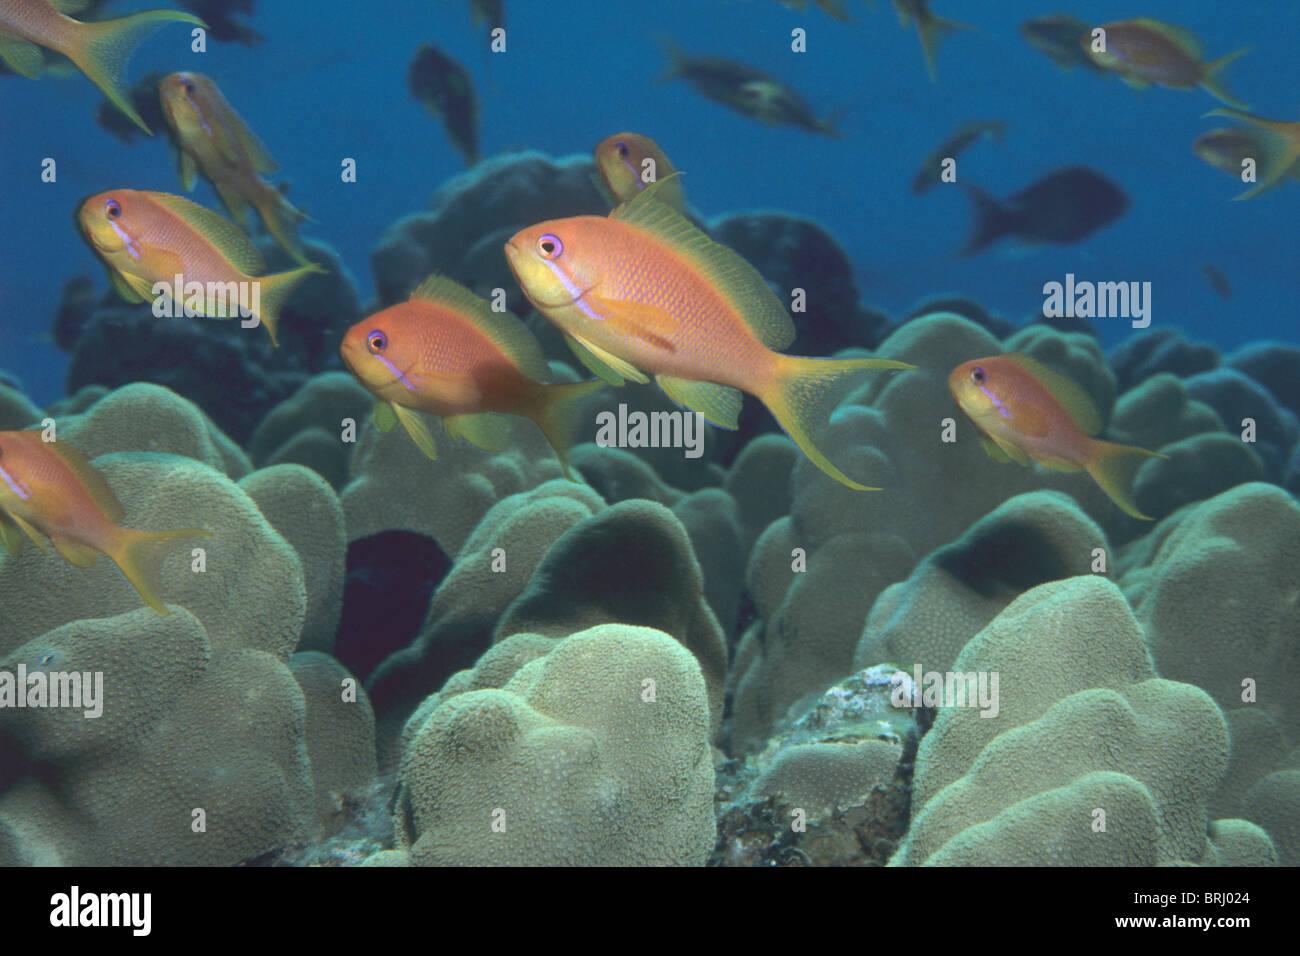 Scalefin anthias, Pseudanthias squamipinnis, in Lower Sinai, Red Sea. - Stock Image